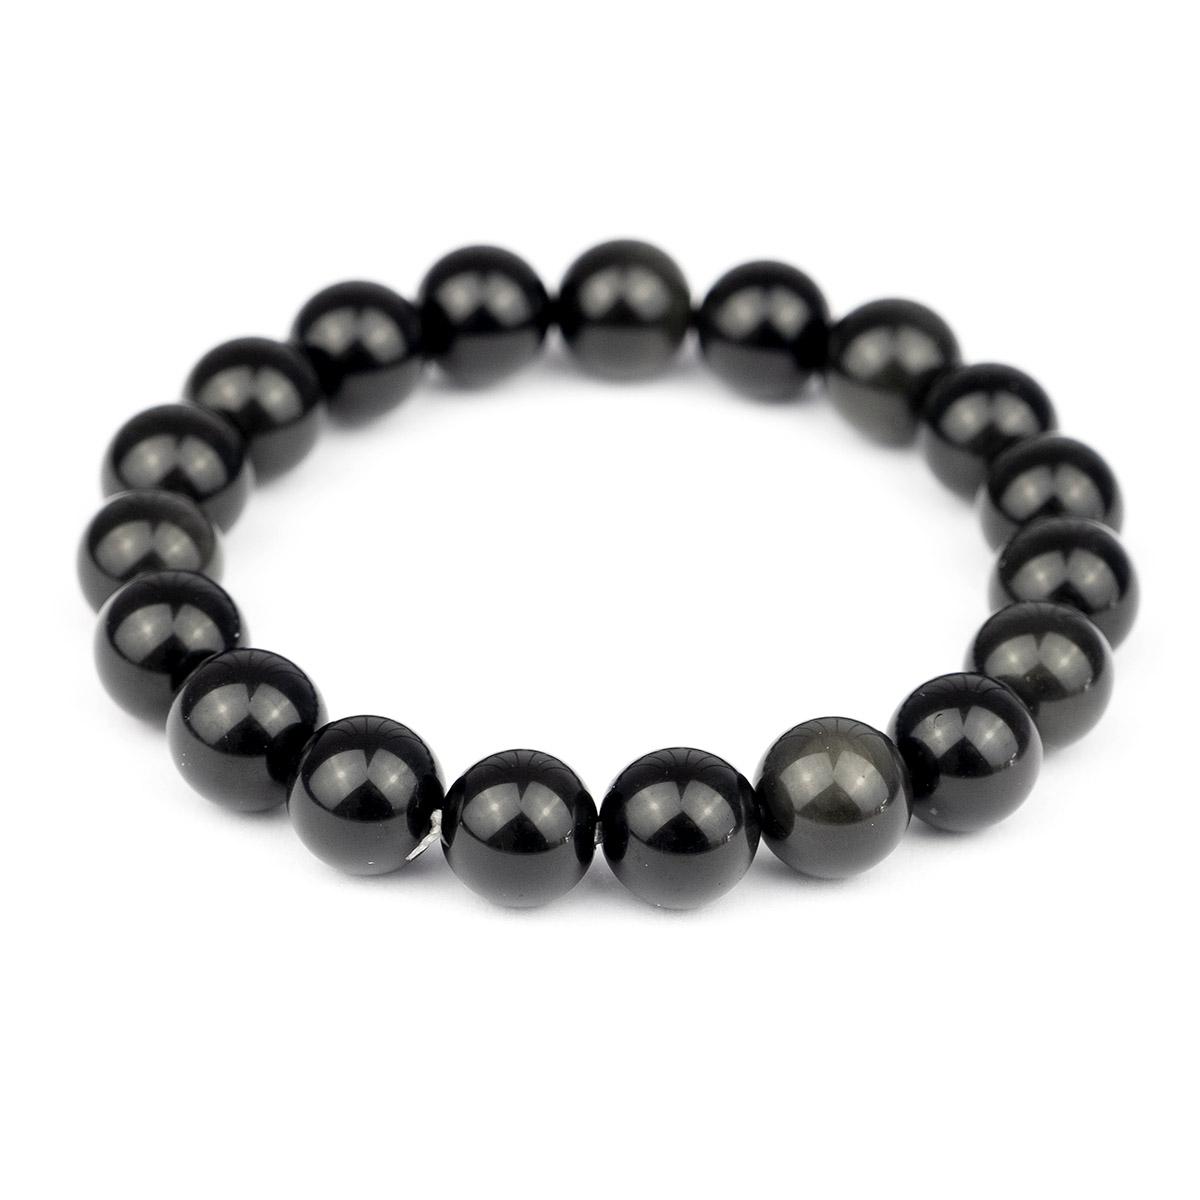 Bracelet extensible en perles d'obsidienne d'or 10mm